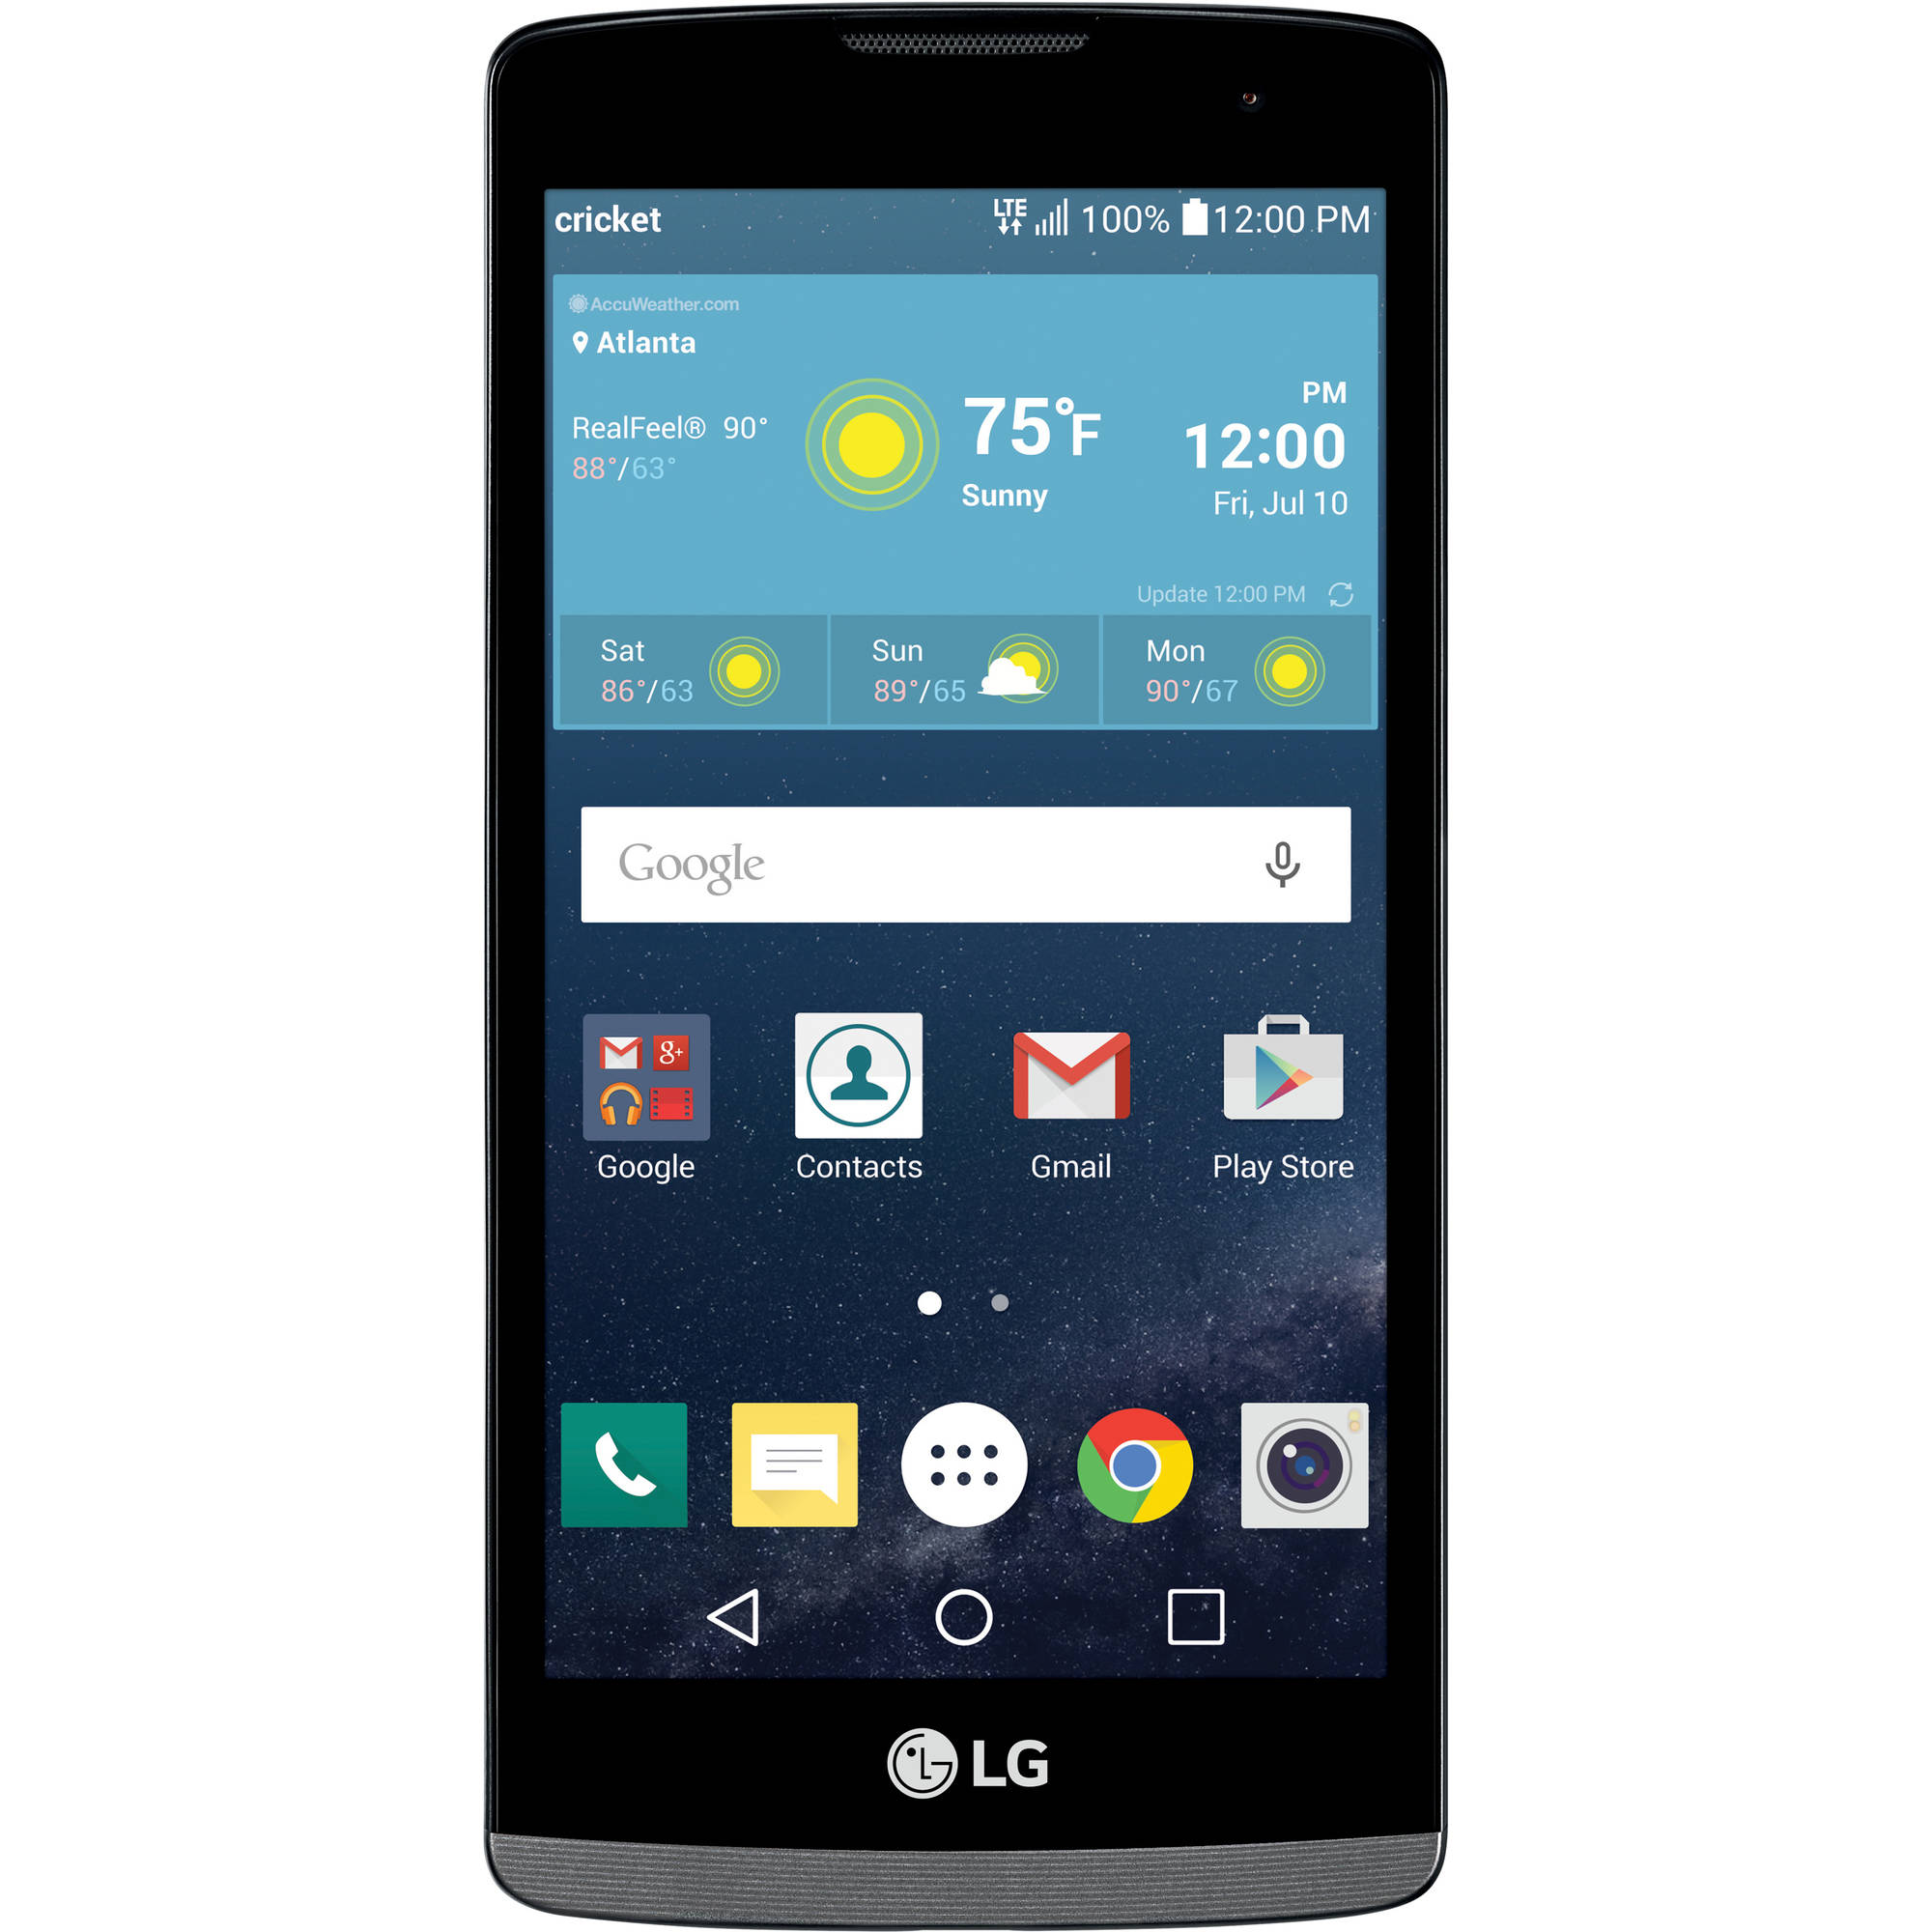 Cricket LG Risio Prepaid Android Smartphone